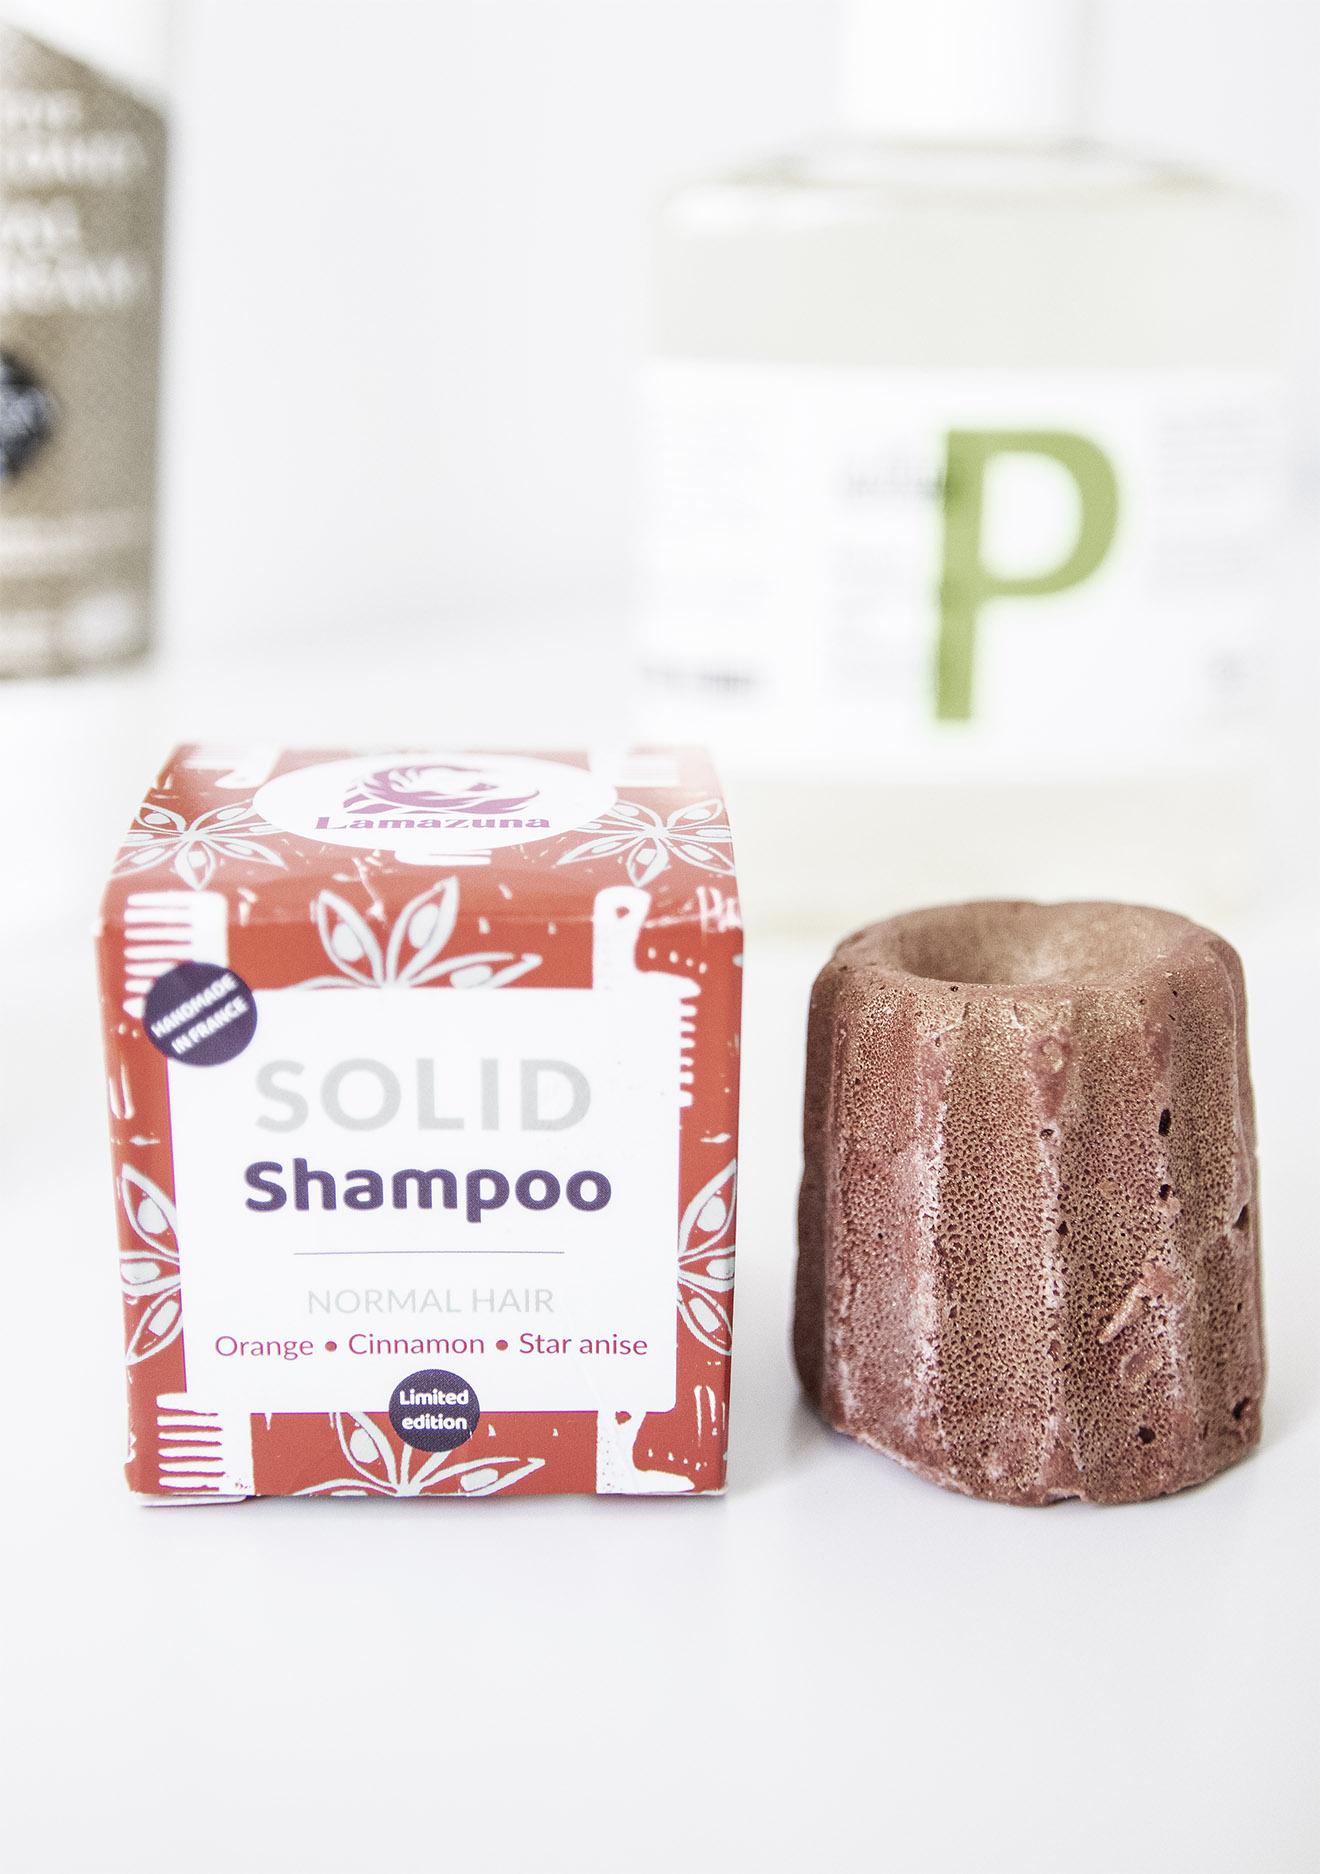 Lamazuna Solid Shampoo Normal Hair